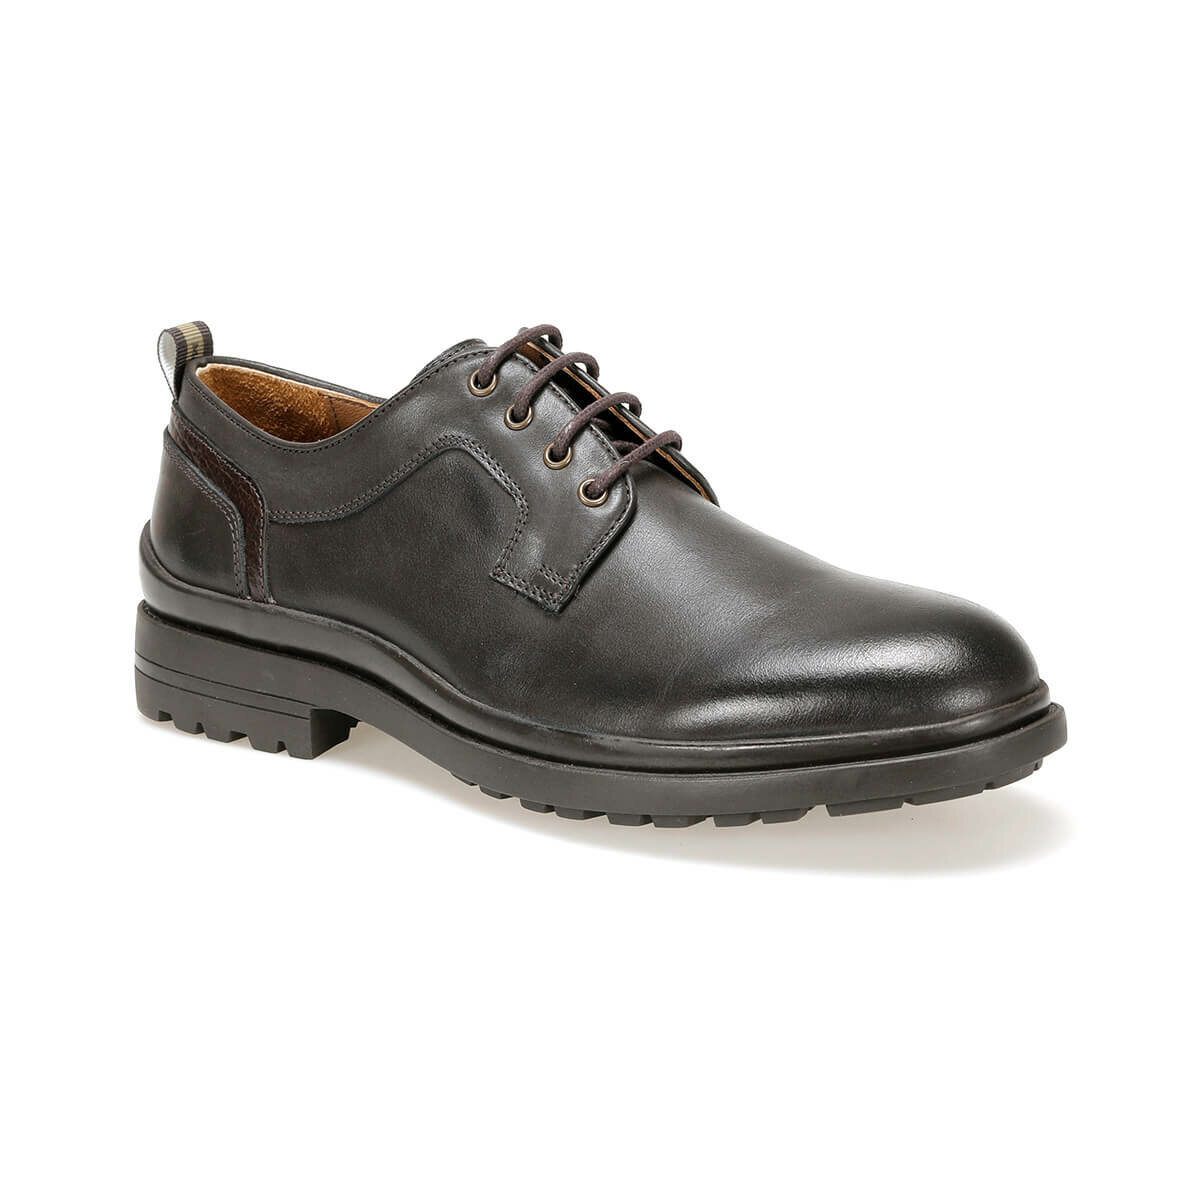 FLO JORDAN 9PR Brown Men 'S Classic Shoes MERCEDES